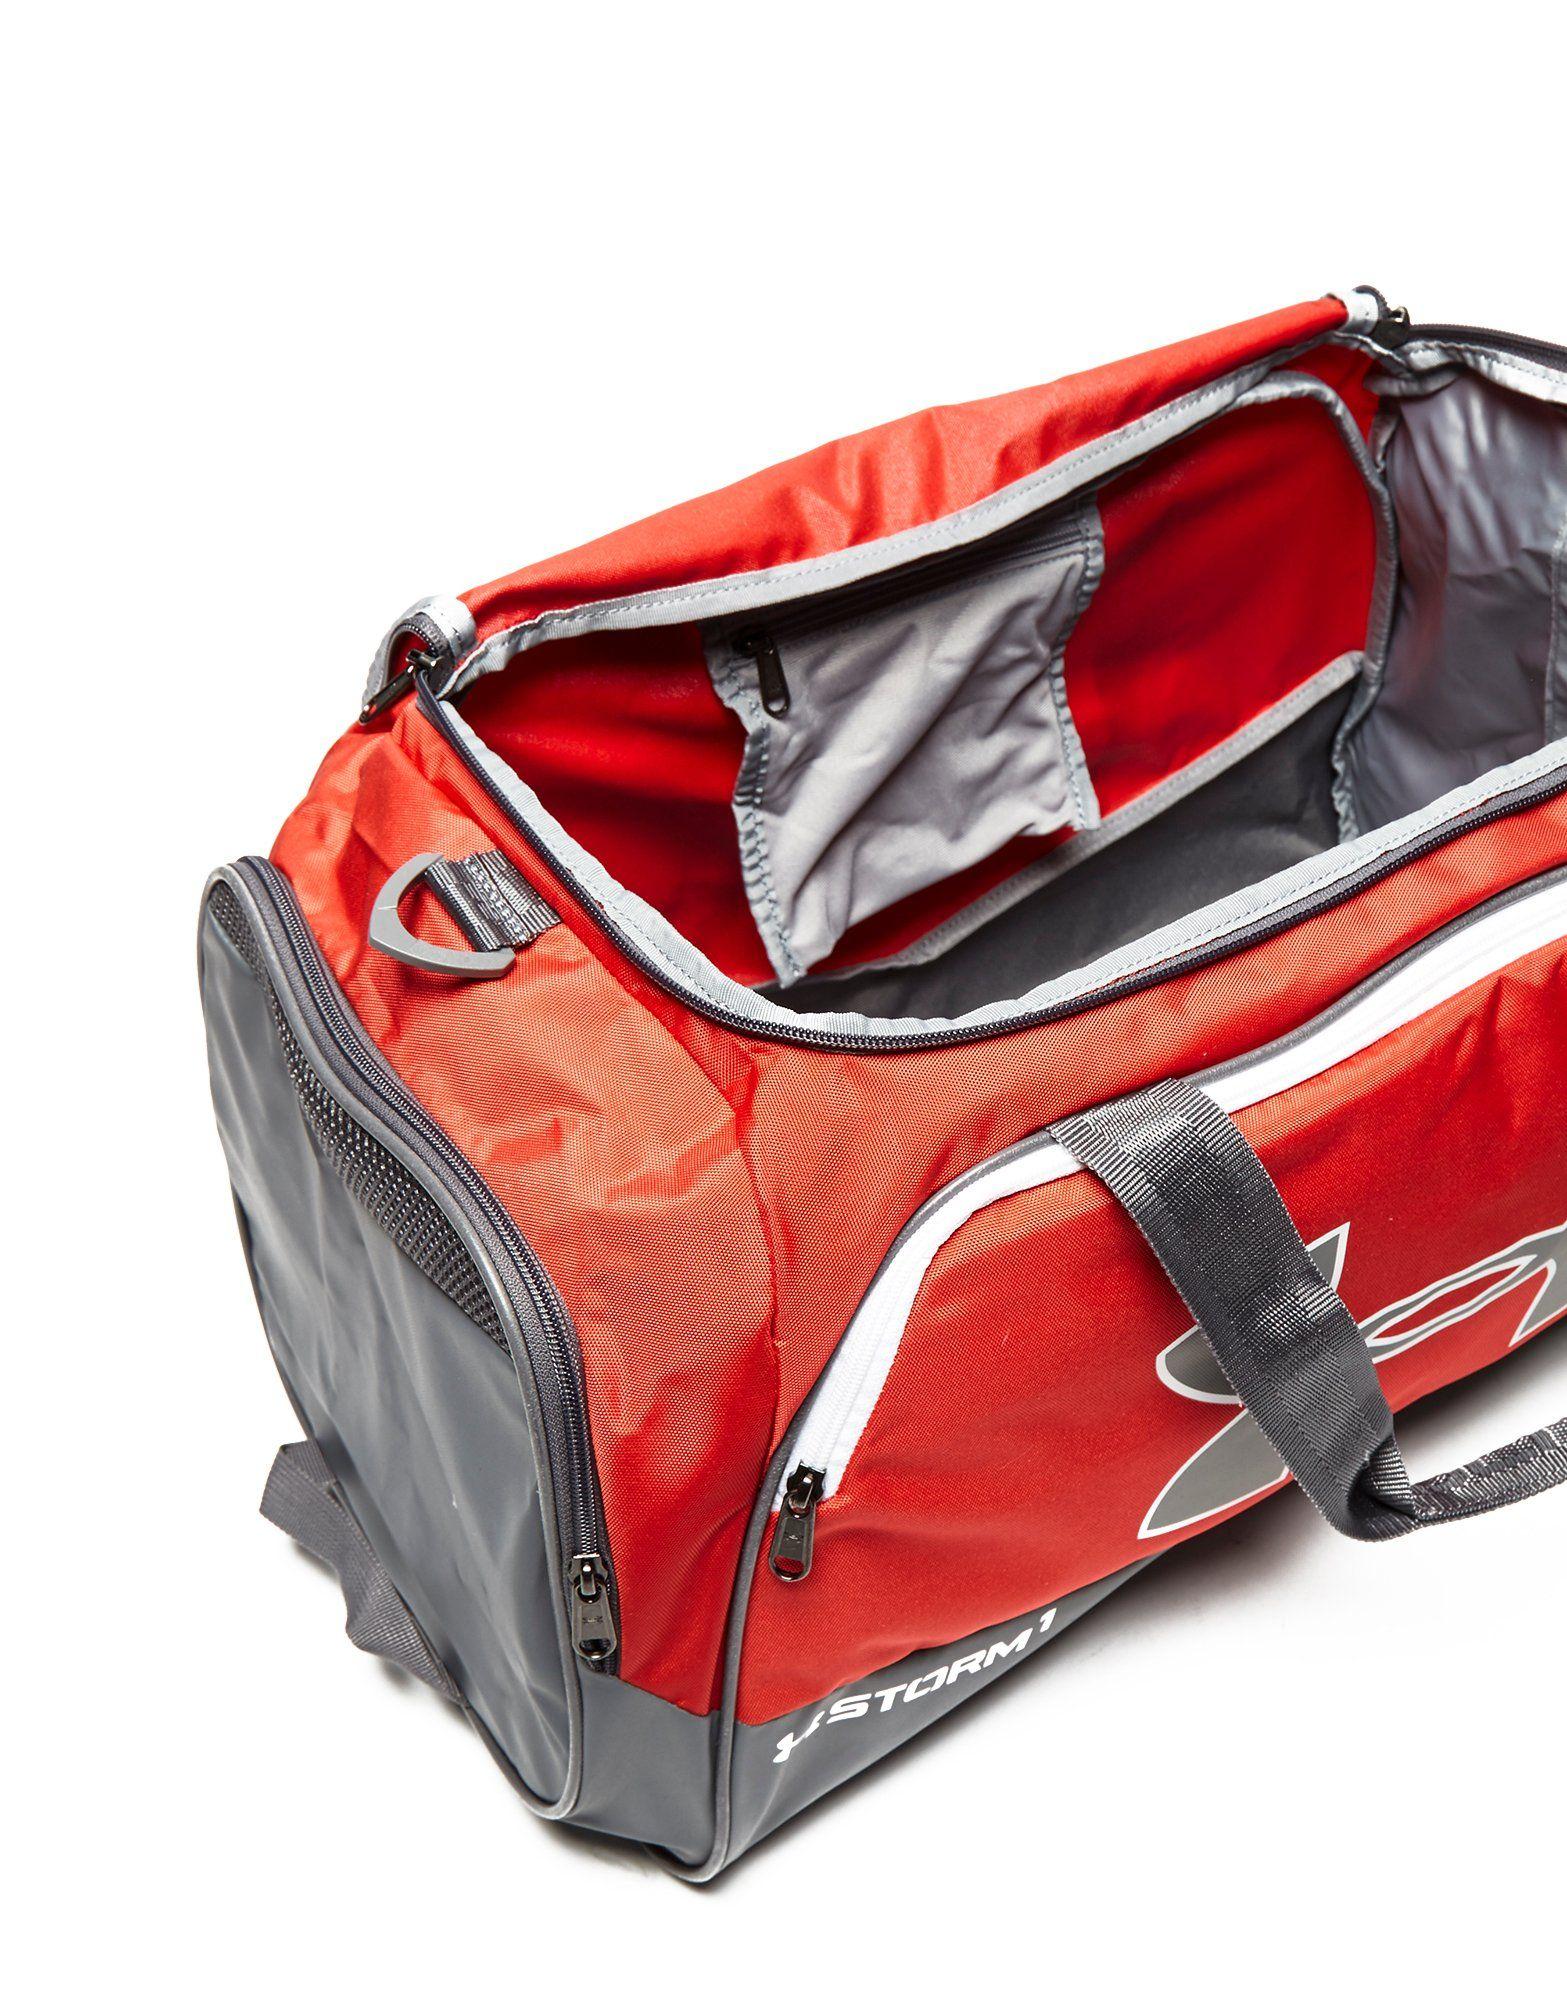 Under Armour Storm Undeniable Duffle Bag